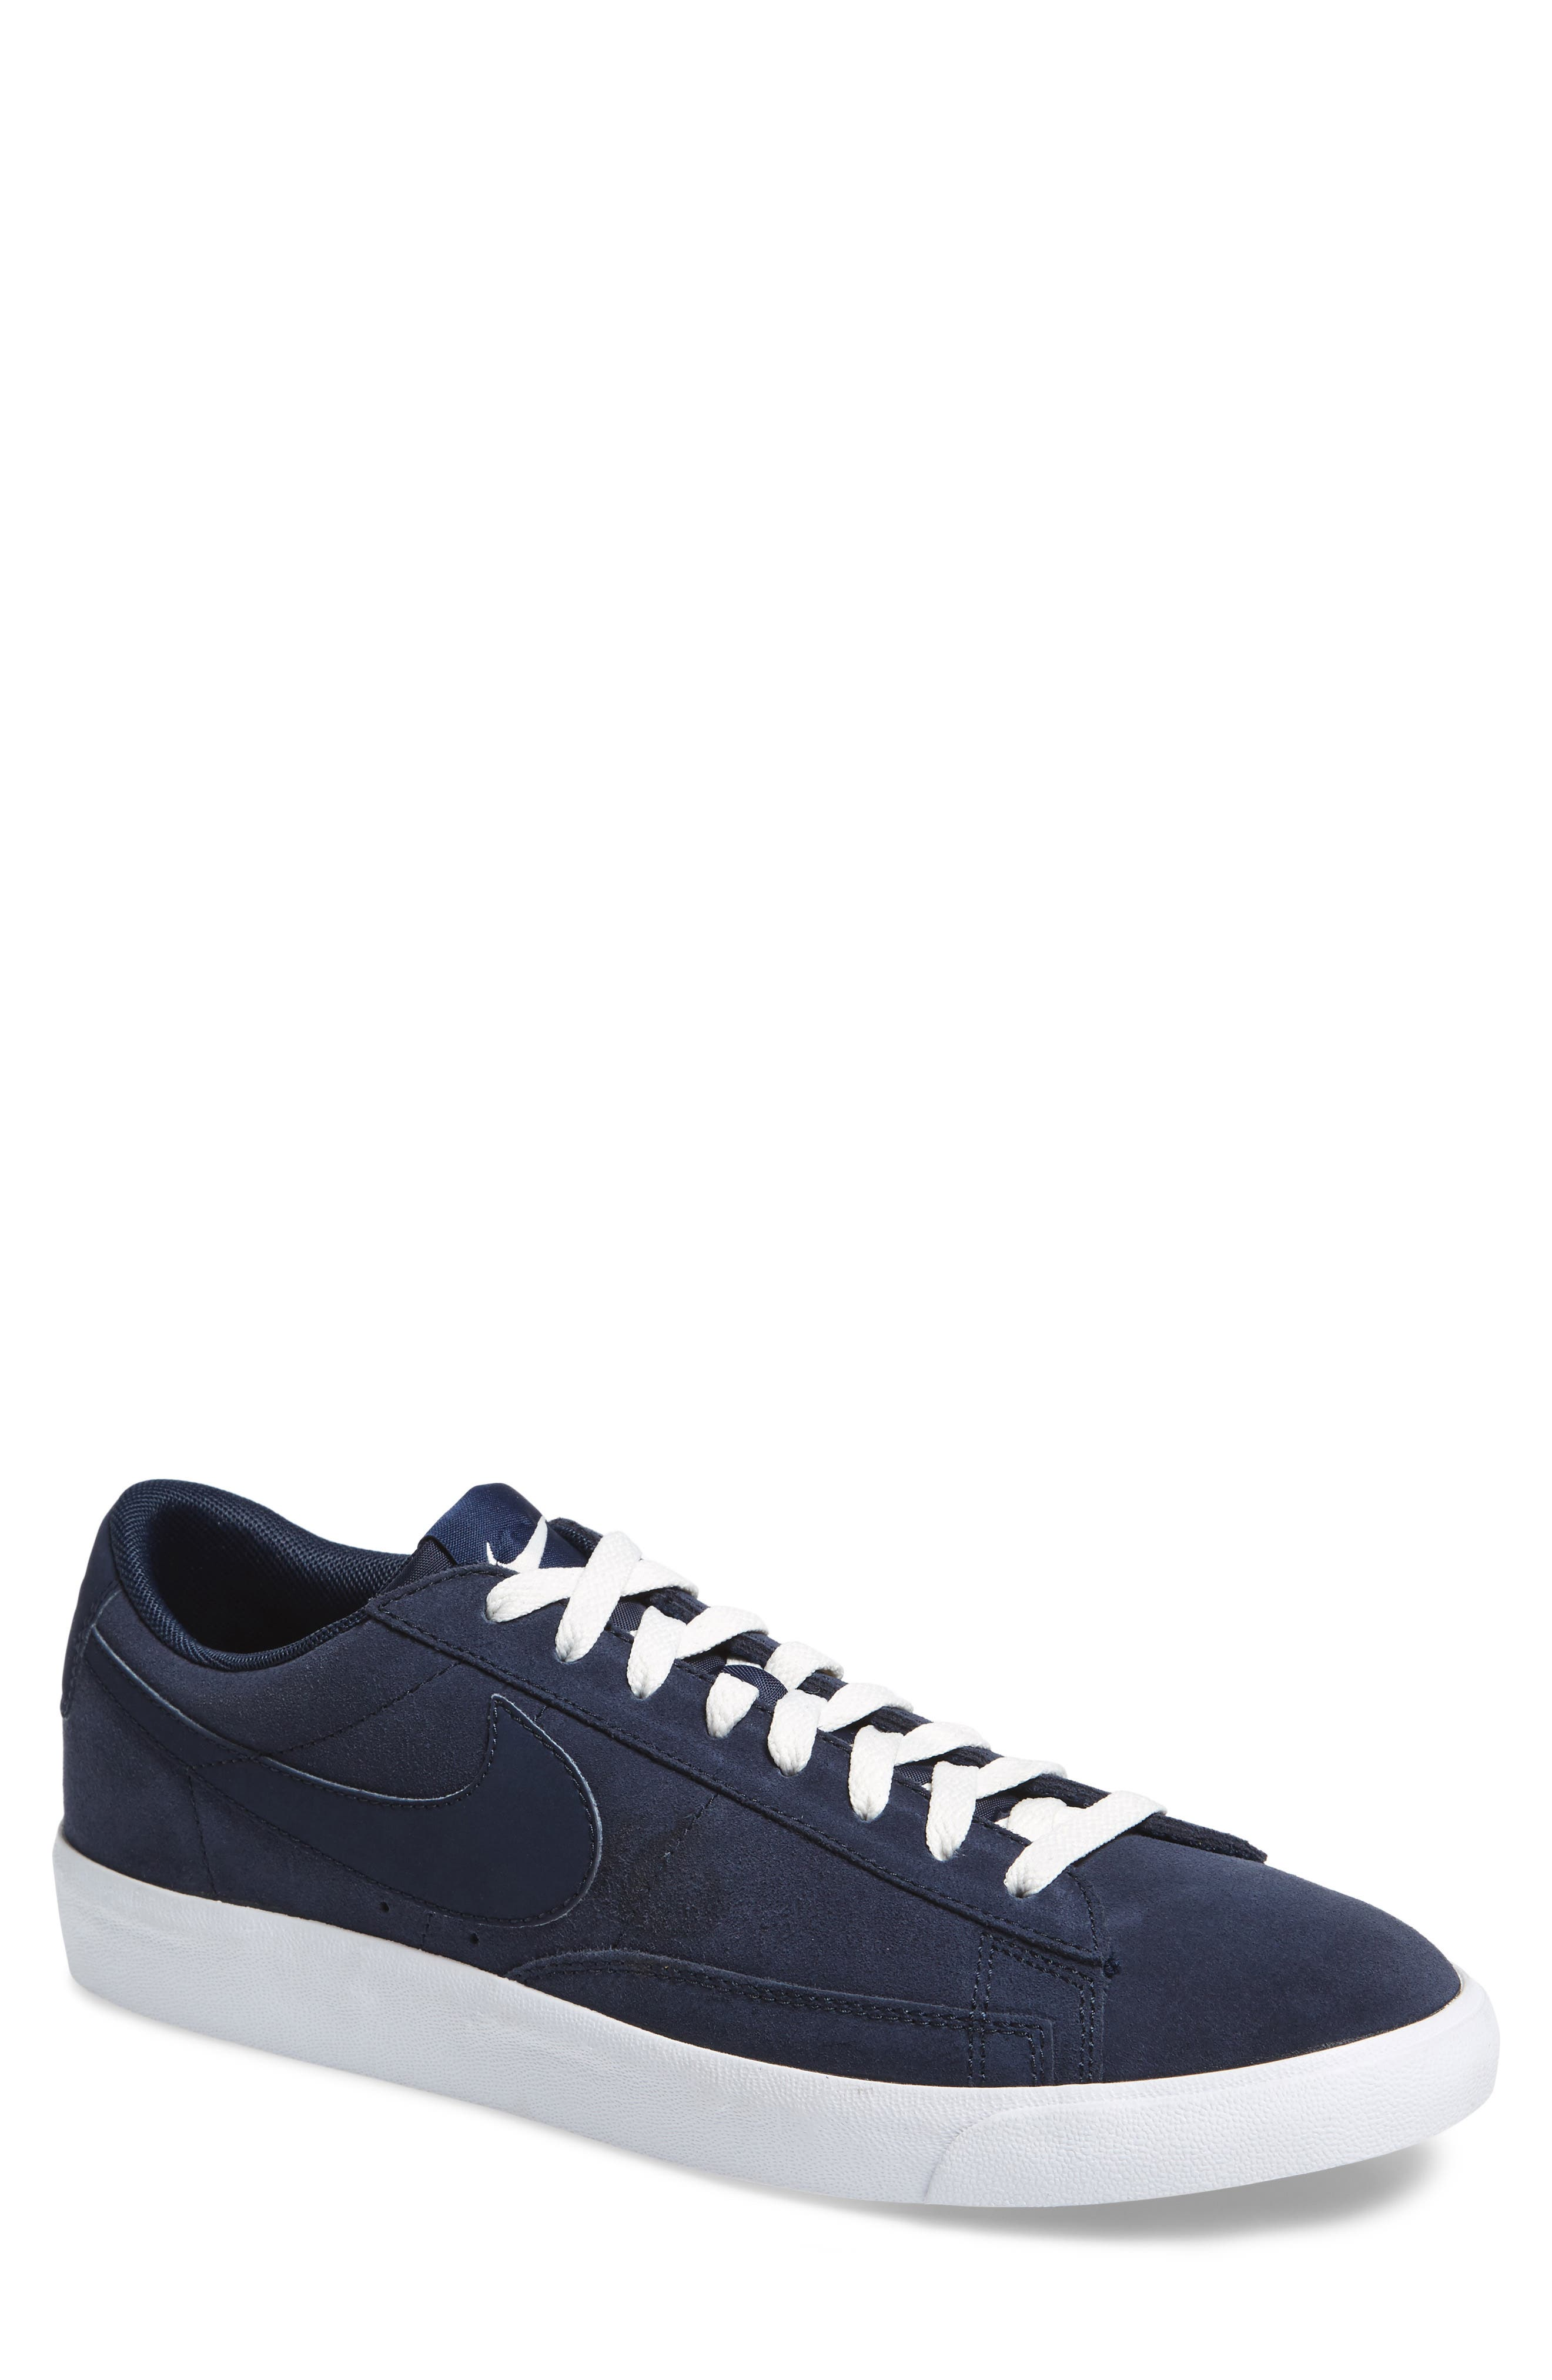 Blazer Low Suede Sneaker,                             Main thumbnail 1, color,                             Obsidian/ Sail/ Brown